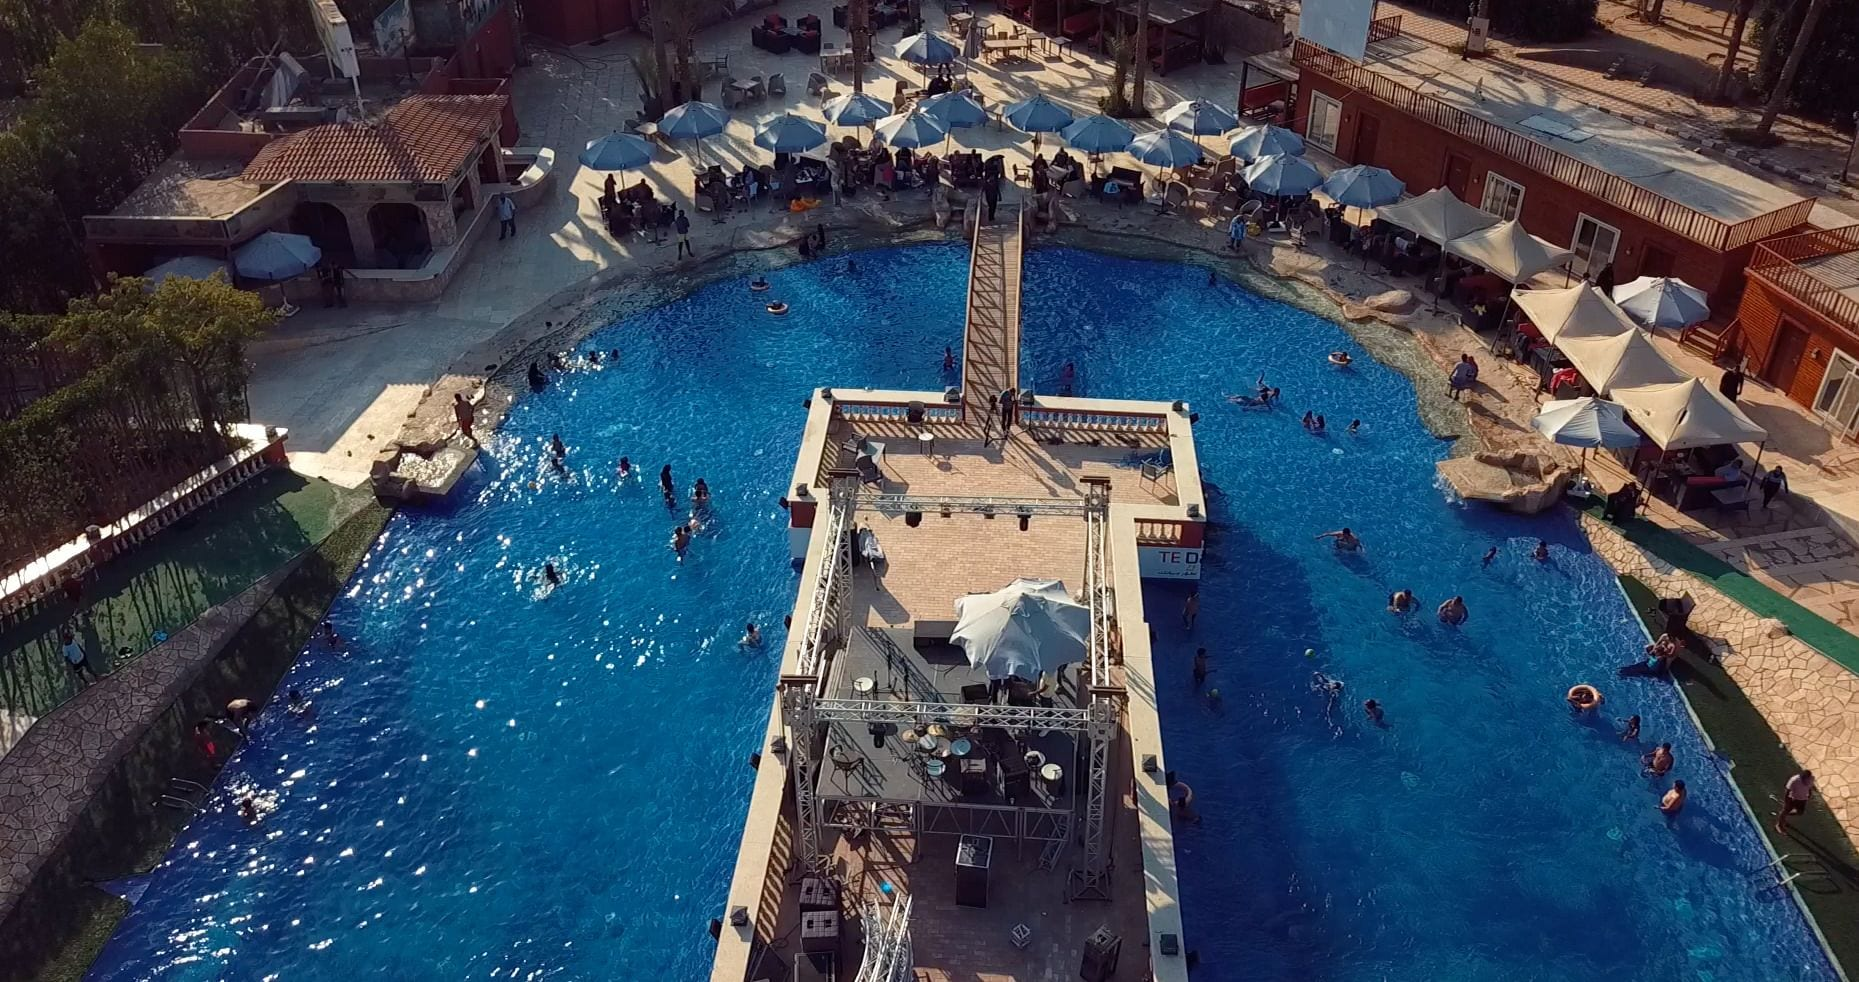 Byoot Bay Hotel & Resort, Unorganized in Al Jizah